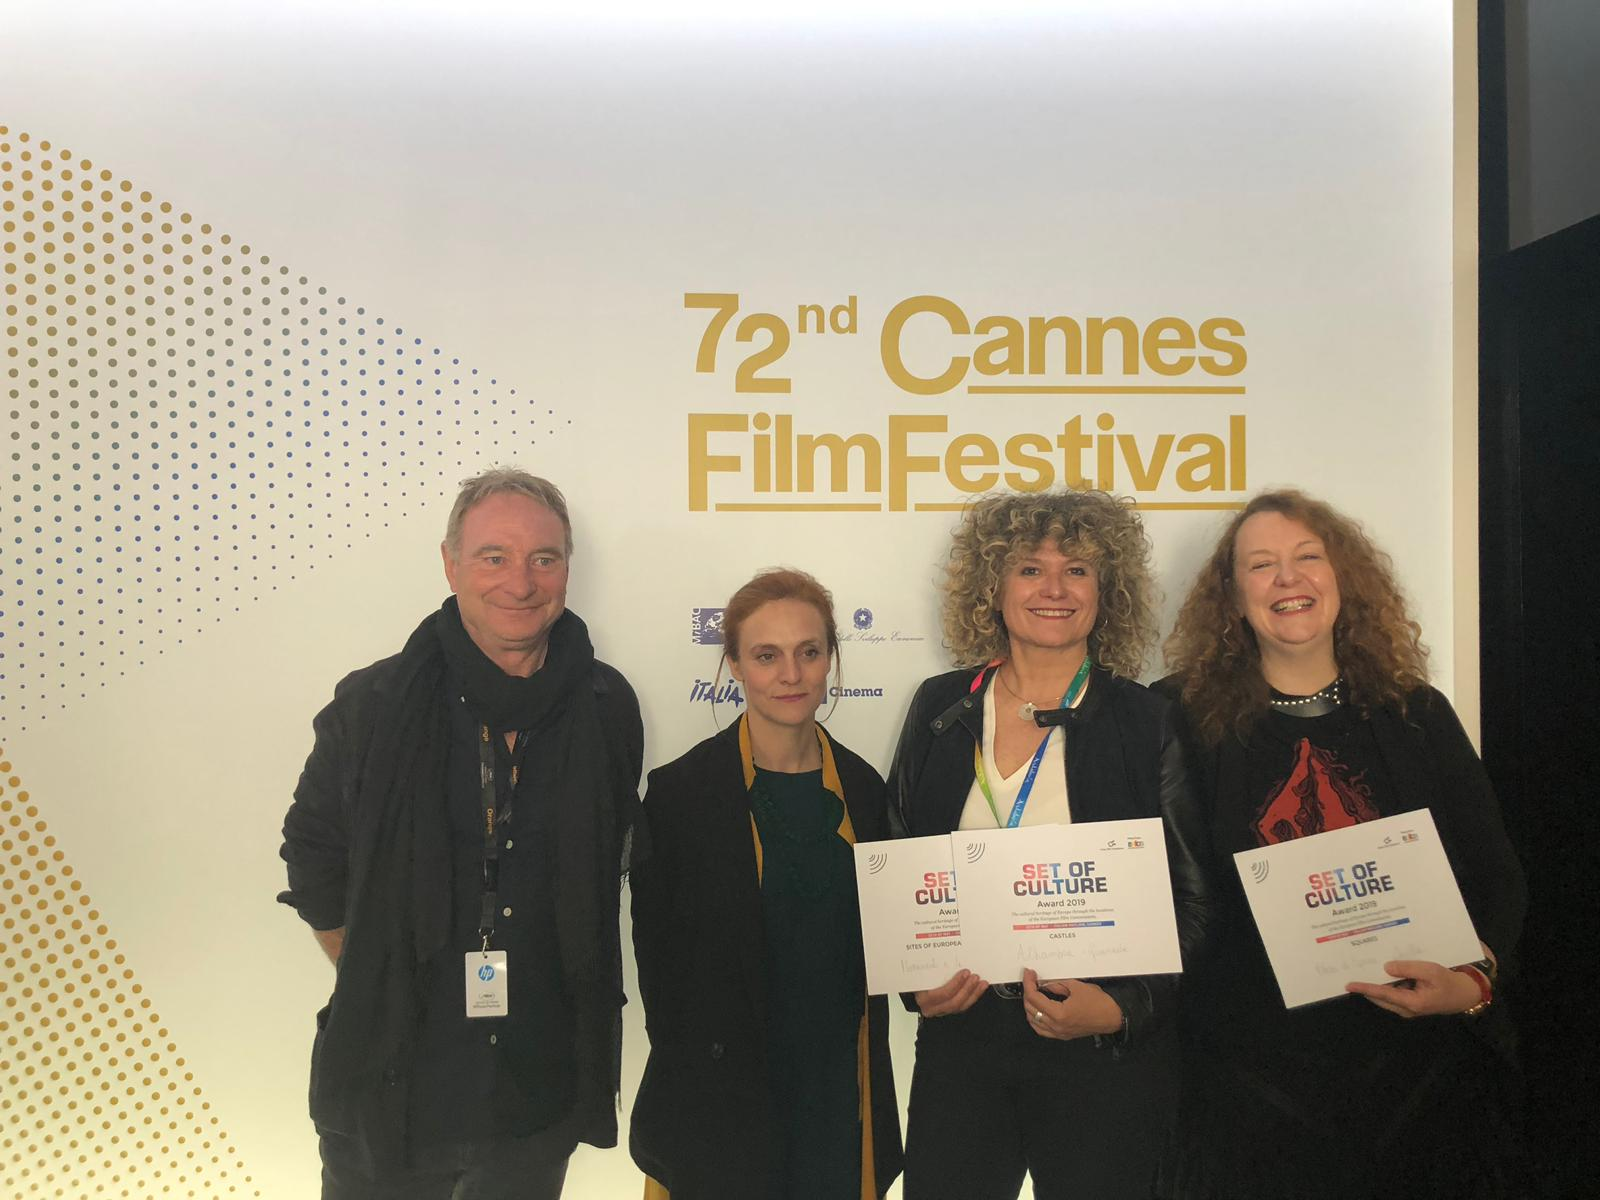 Fotografía Premios Set of Culture Awards - Andalucía Film Commission